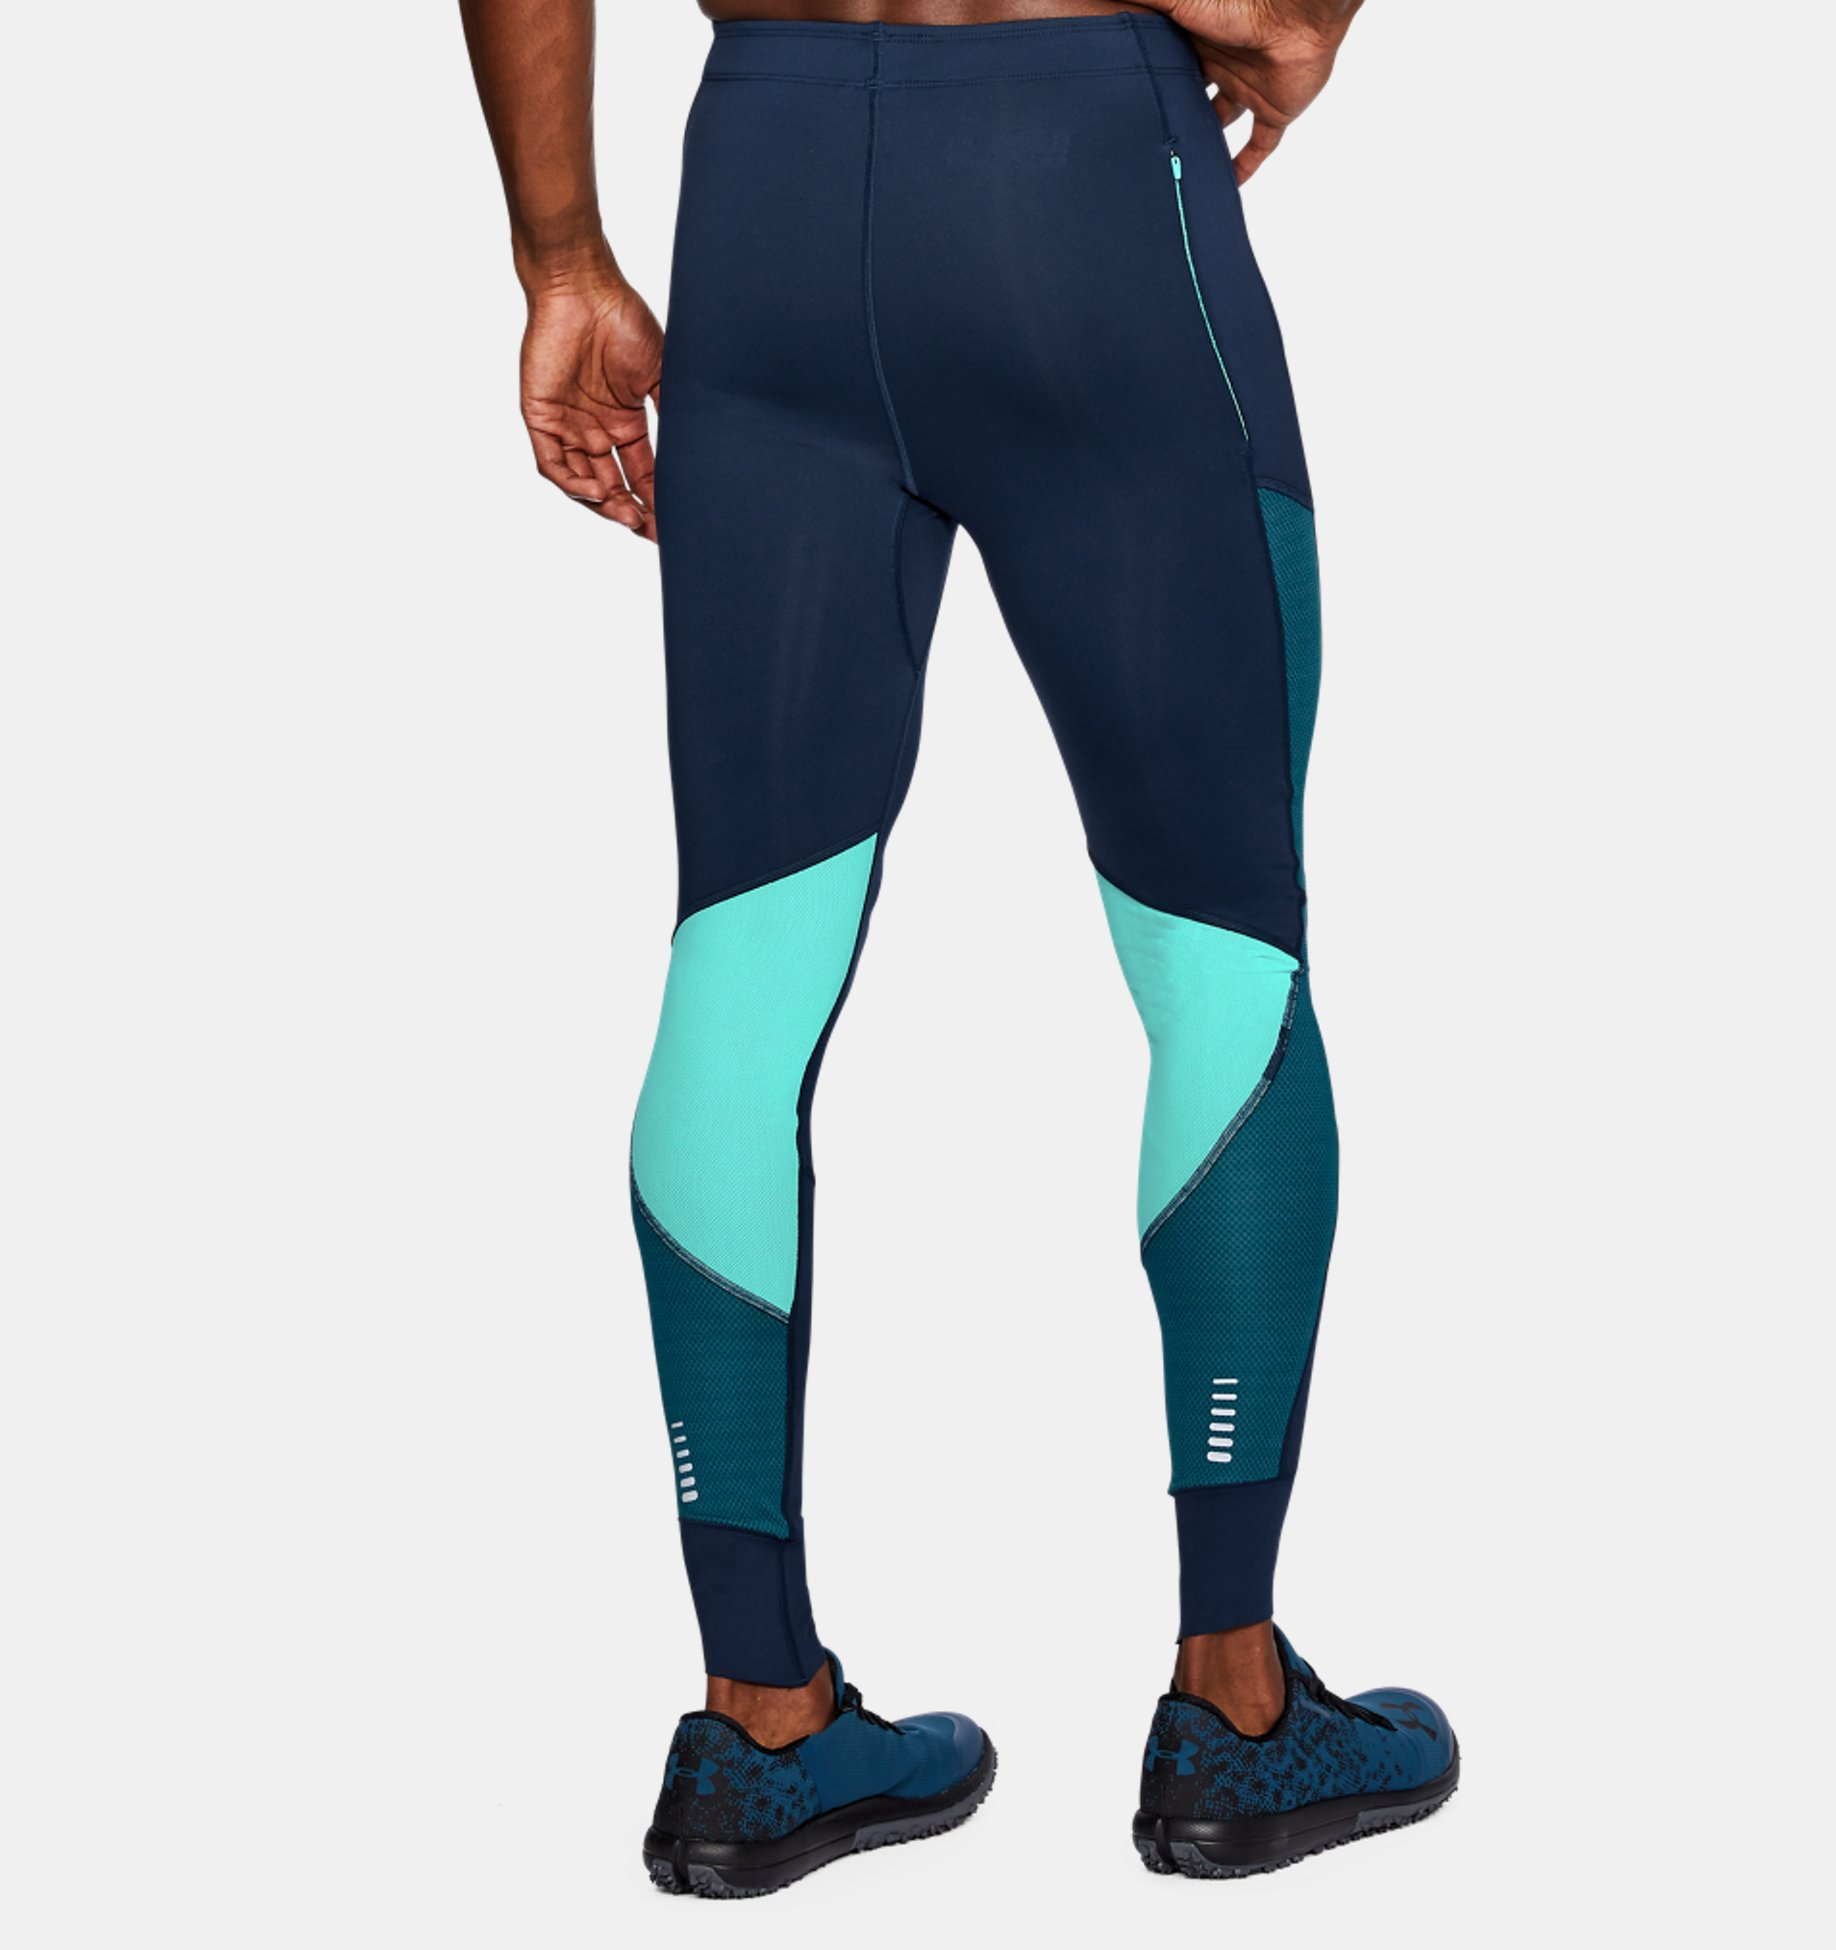 5ce479518e16af Men's ColdGear® Reactor Run Leggings | Under Armour AU